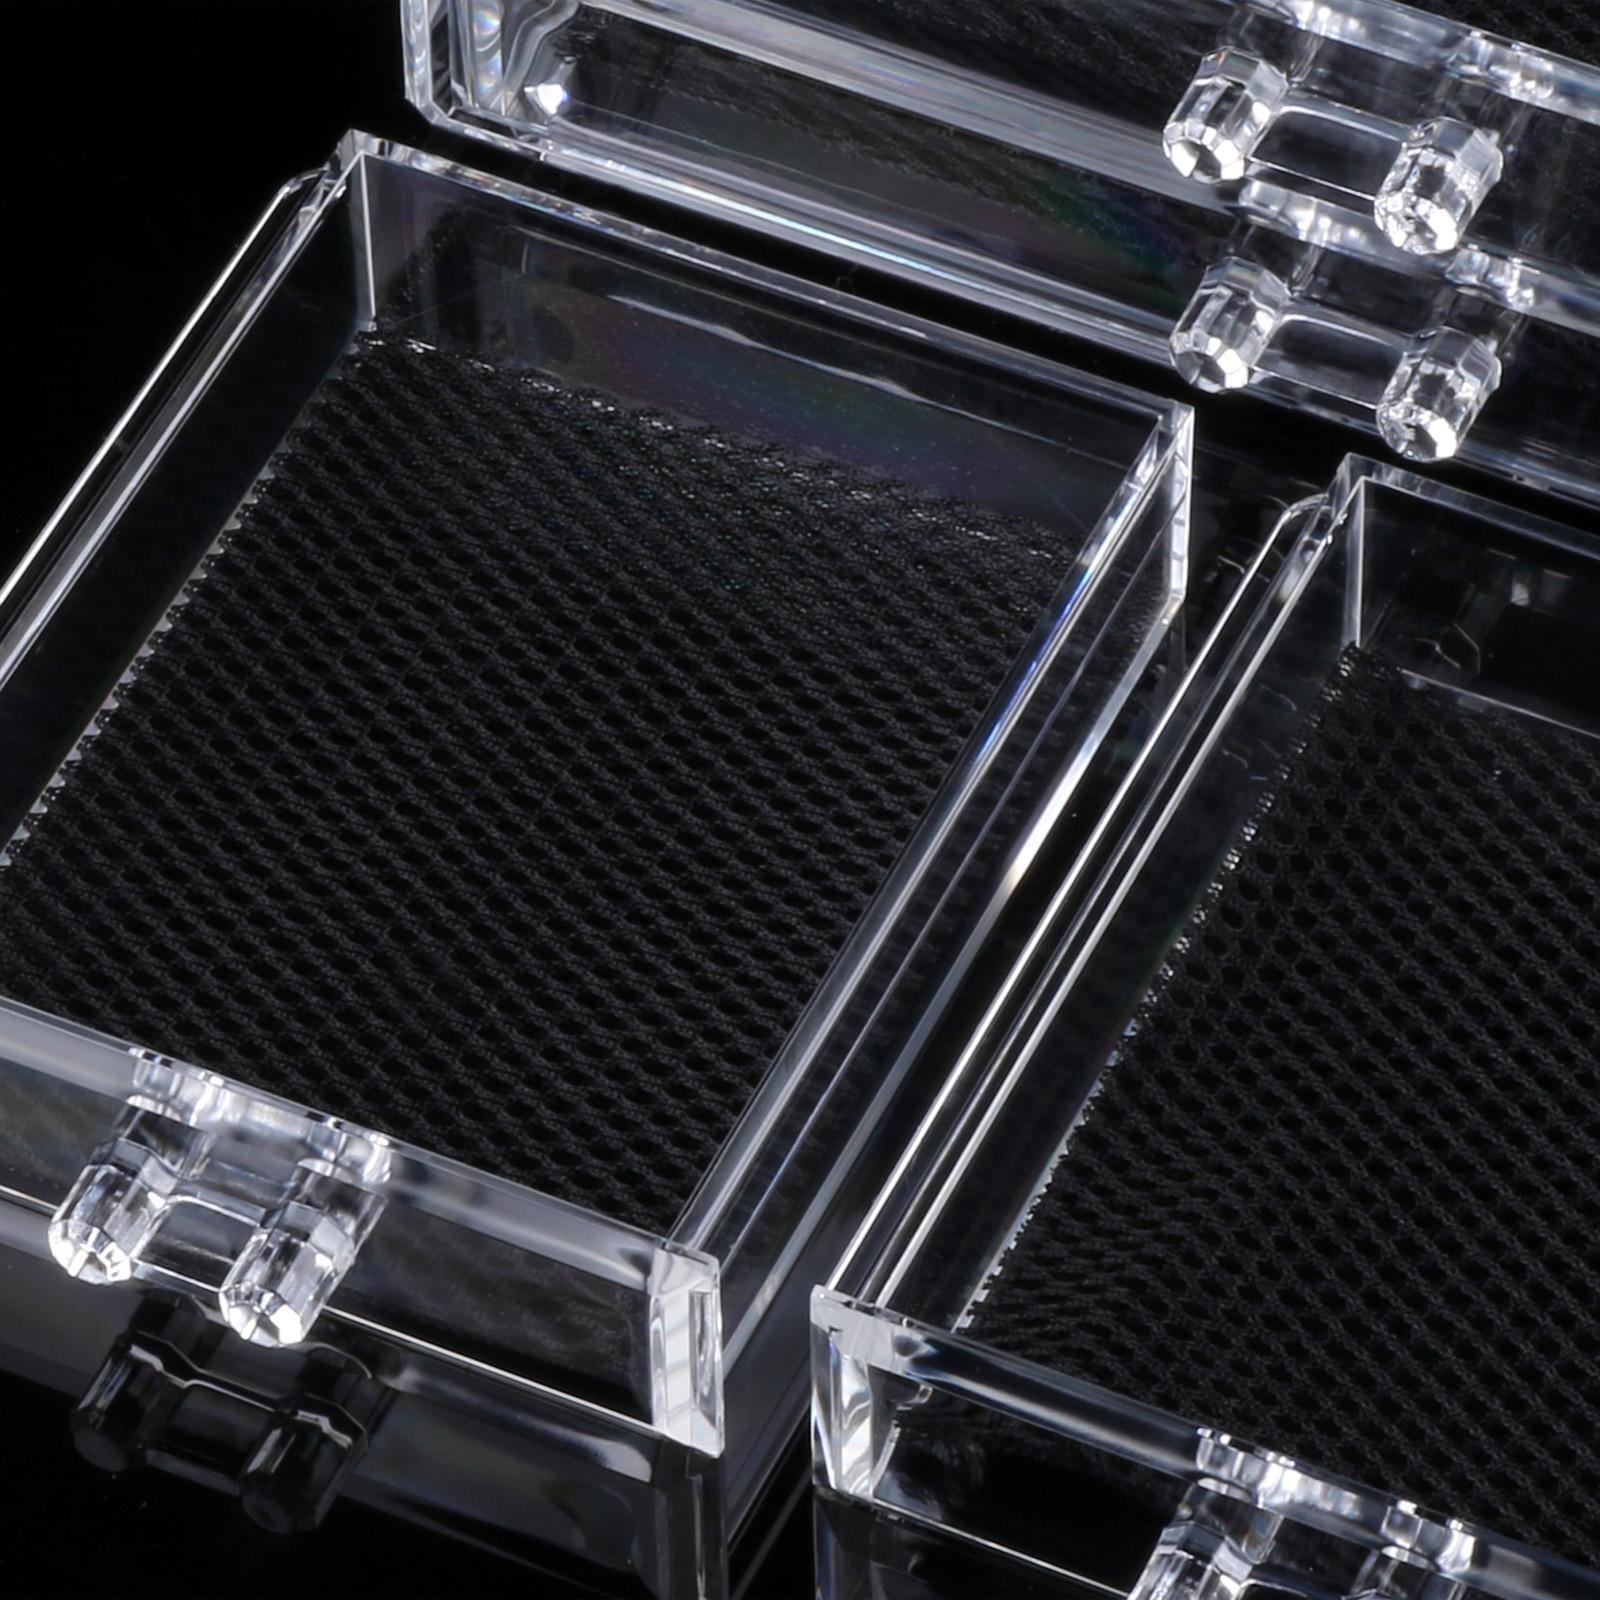 Acrylic Makeup Drawers Grids 3 Tiers Display 4